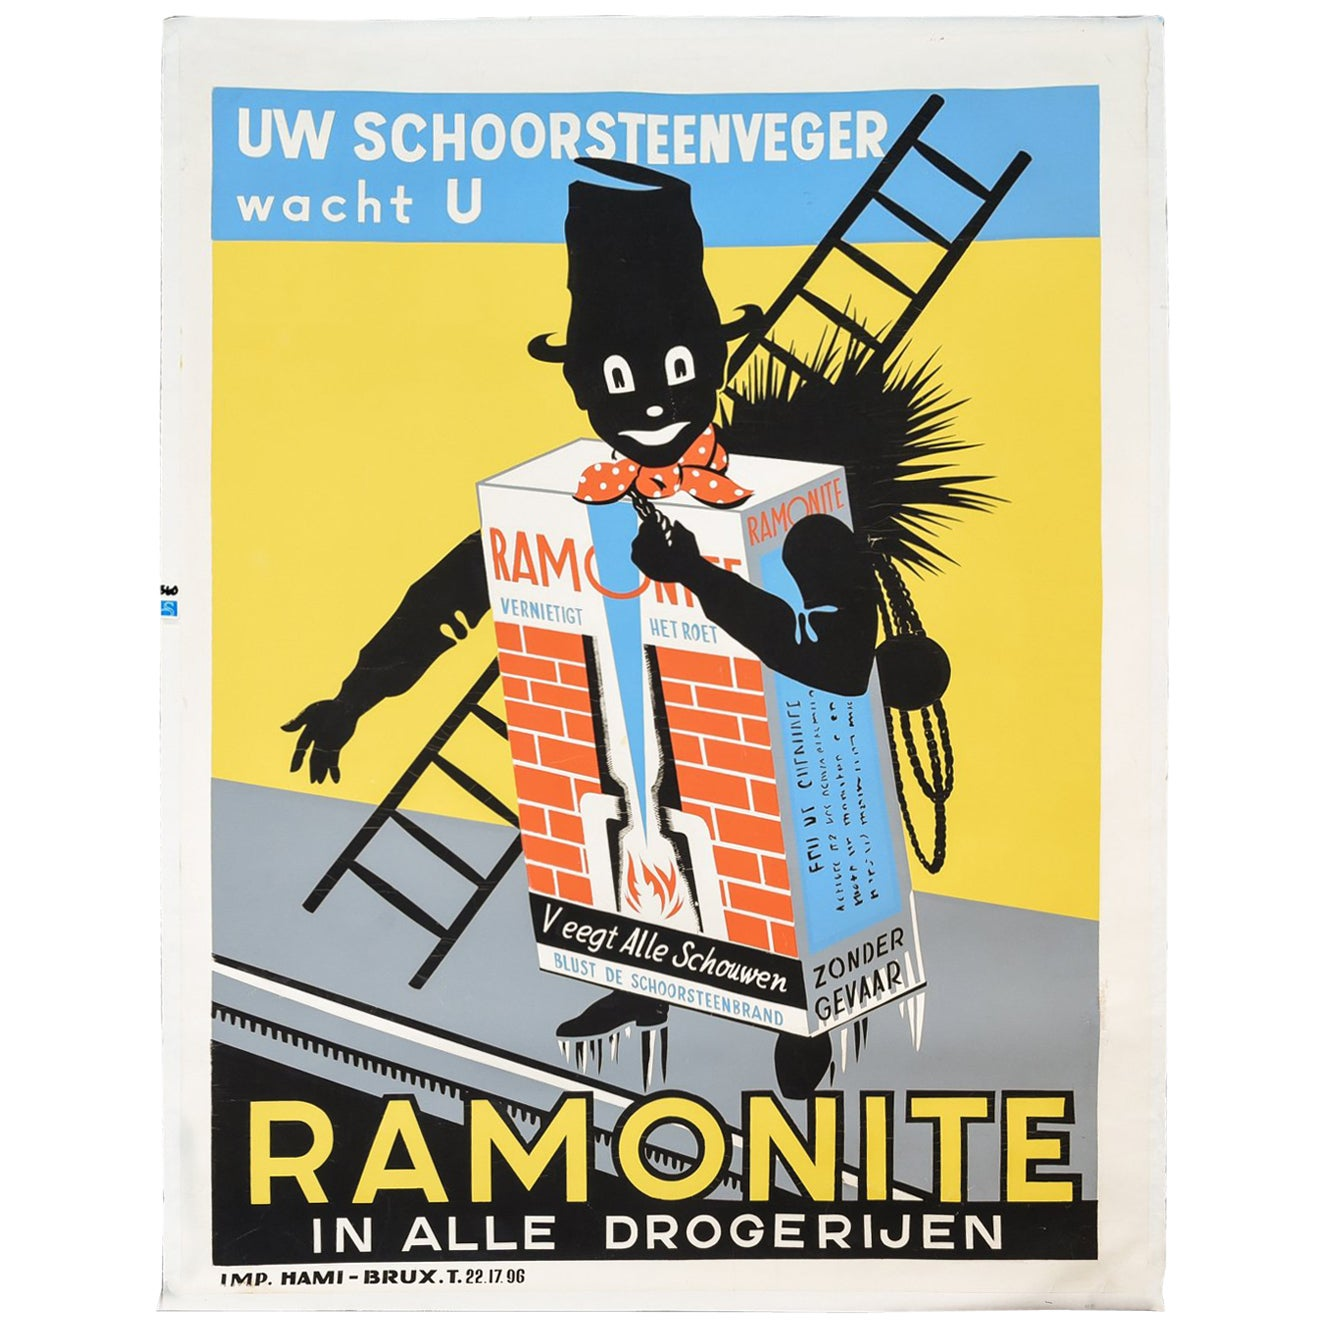 Vintage Ramonite Chimney Sweep Poster, circa 1920